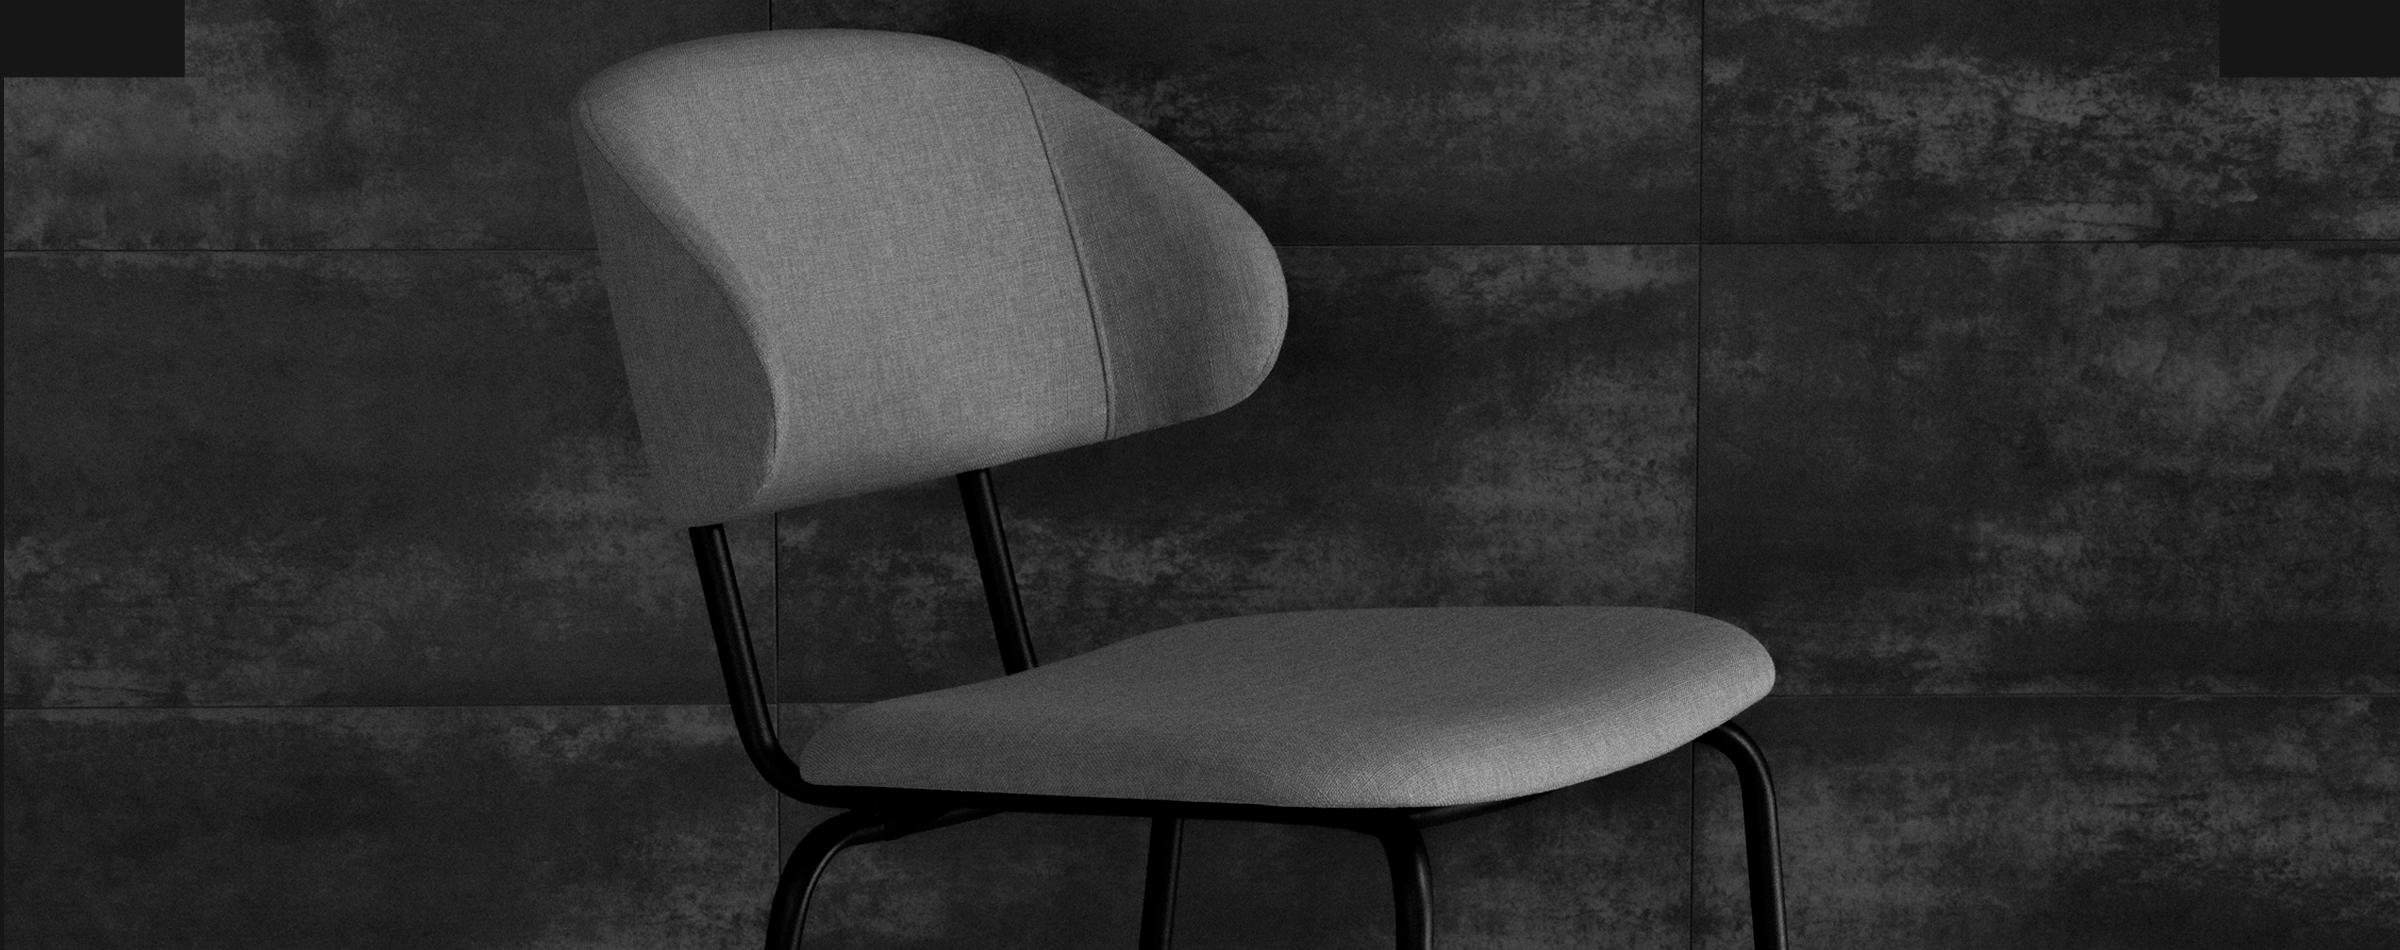 KIRA Collection - Cadeira estofada em metal